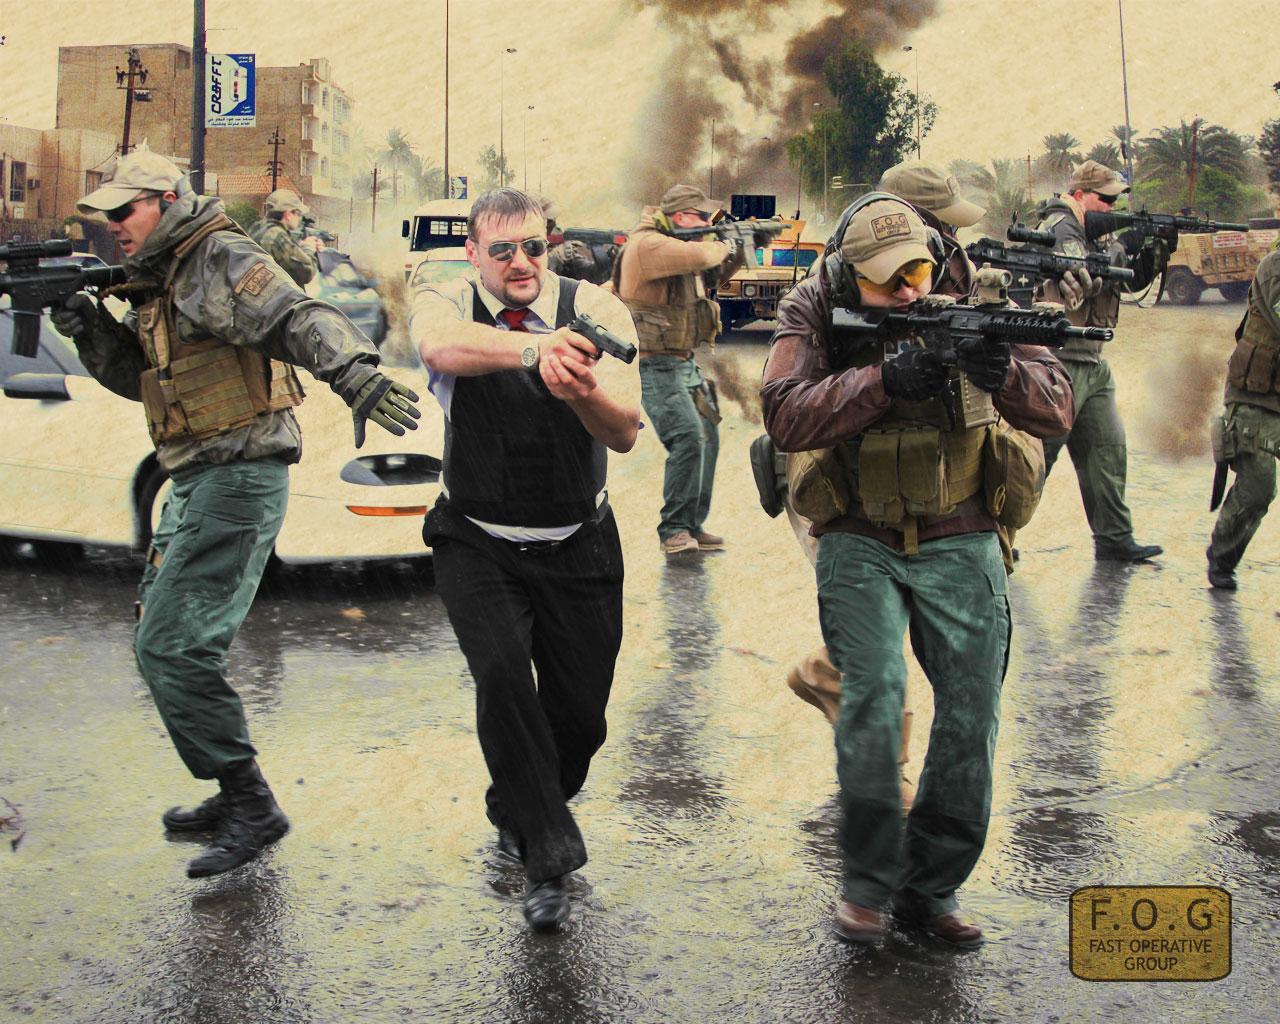 FBI agent in action wallpaper design by grafnullReal Fbi Agent